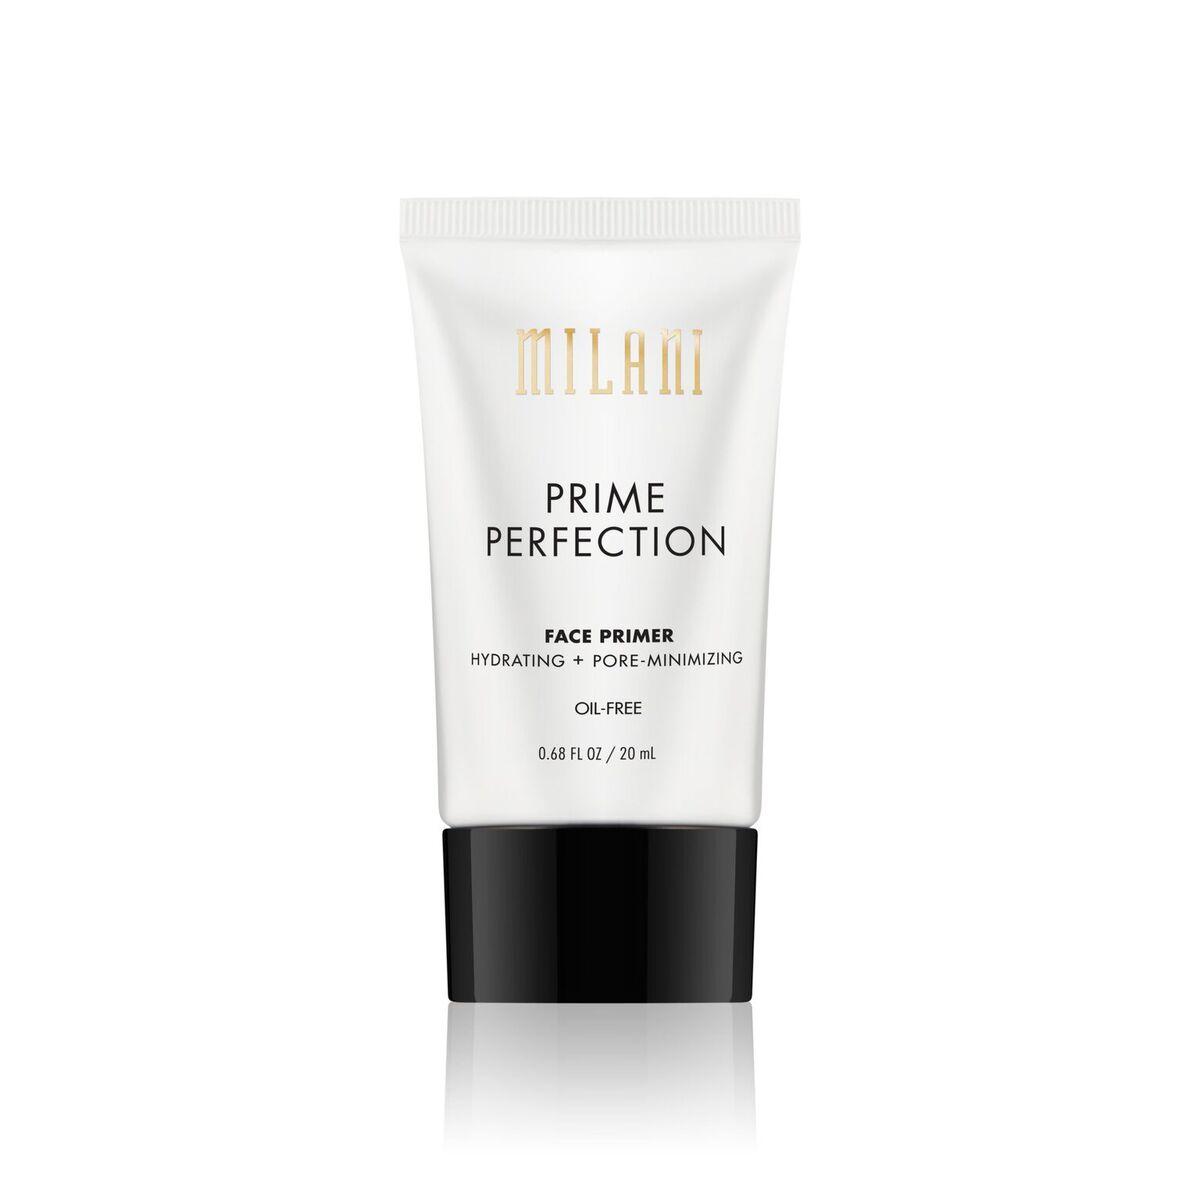 PRIME PERFECTION HYDRATING + PORE-MINIMIZING FACE PRIMER